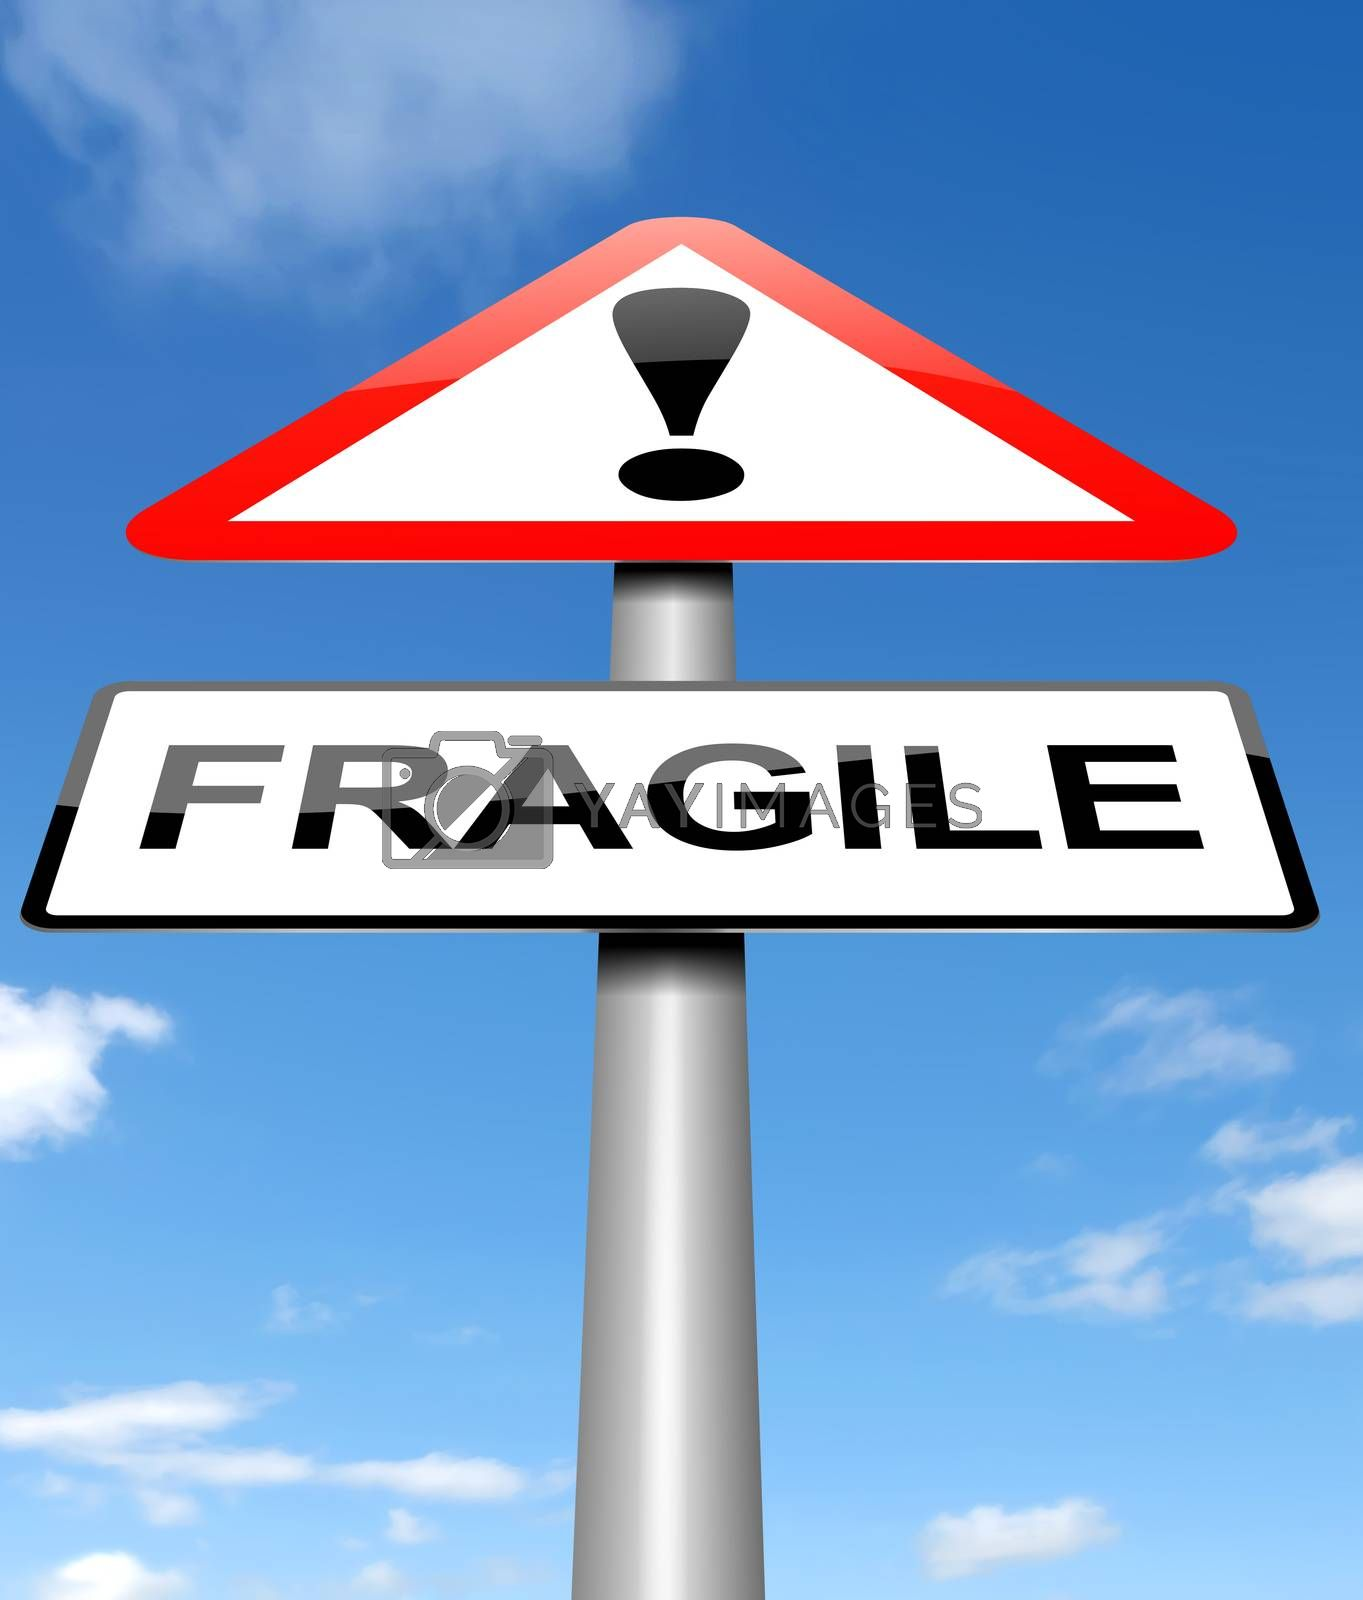 Fragile sign concept. by 72soul